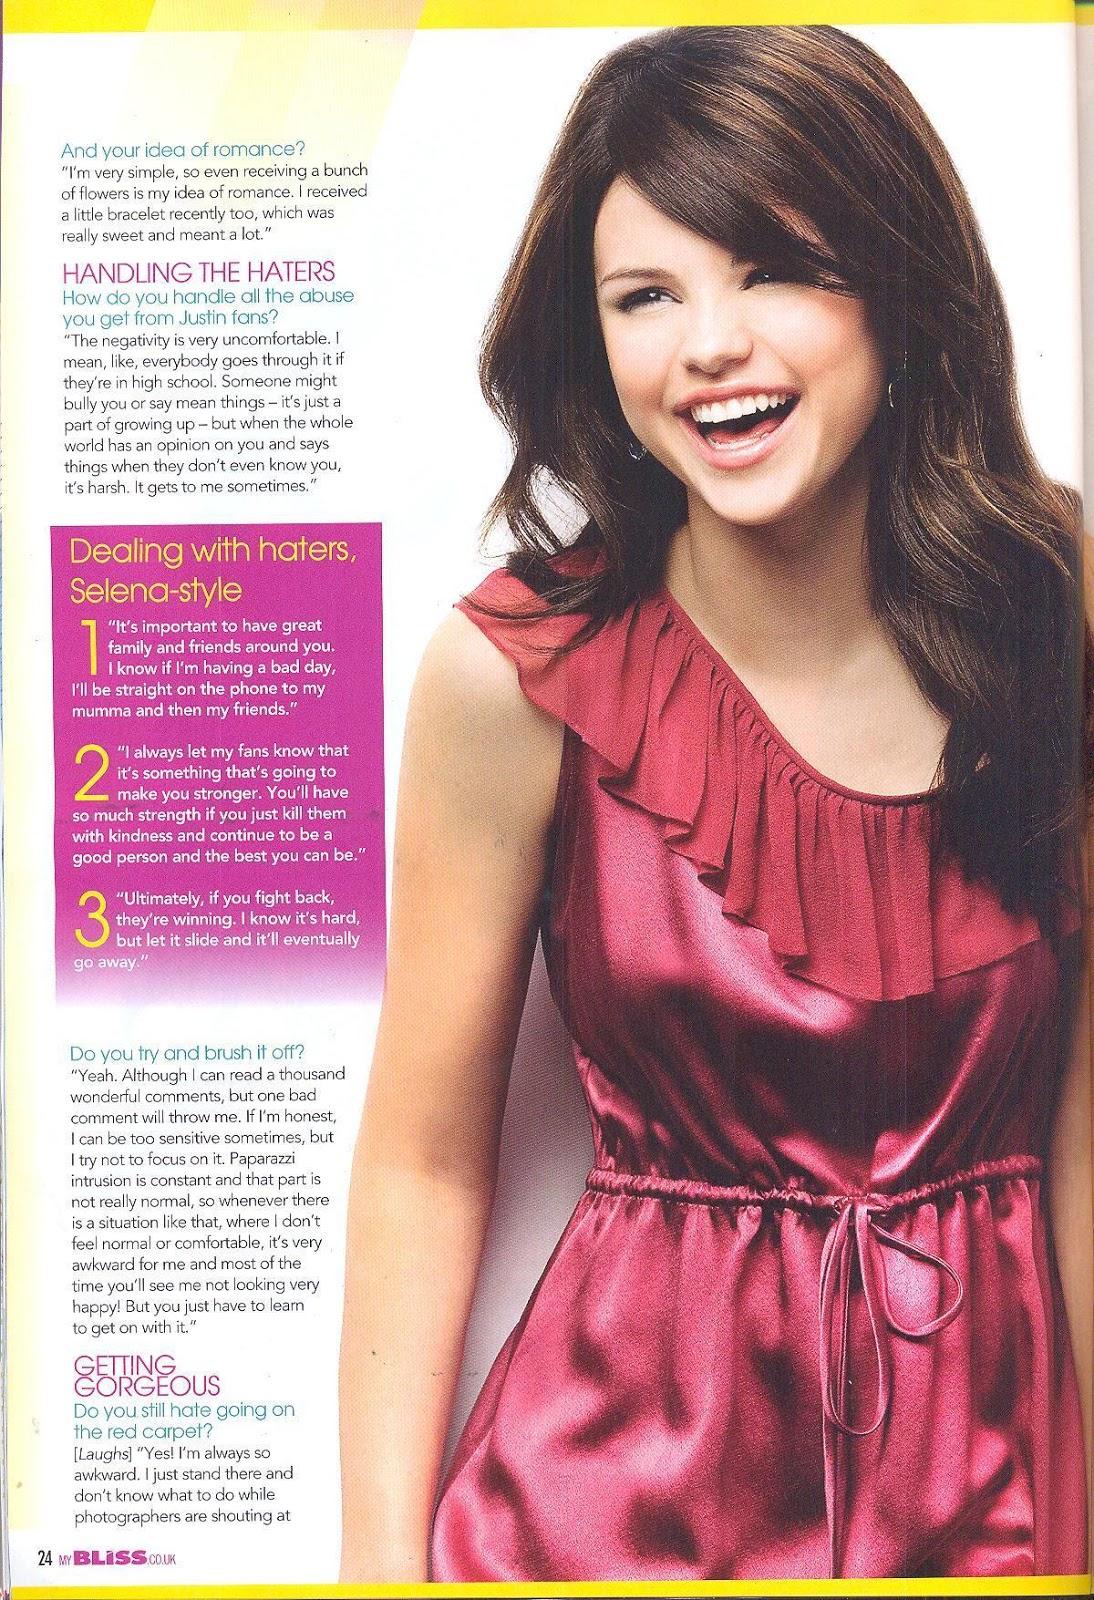 http://4.bp.blogspot.com/-r463tquFkqI/UVcRHonVblI/AAAAAAABZWY/qCWVLrj47YQ/s1600/Selena-Magazines-Scans-Bliss-June-July-2011-selena-gomez-22400822-1200-1755.jpg